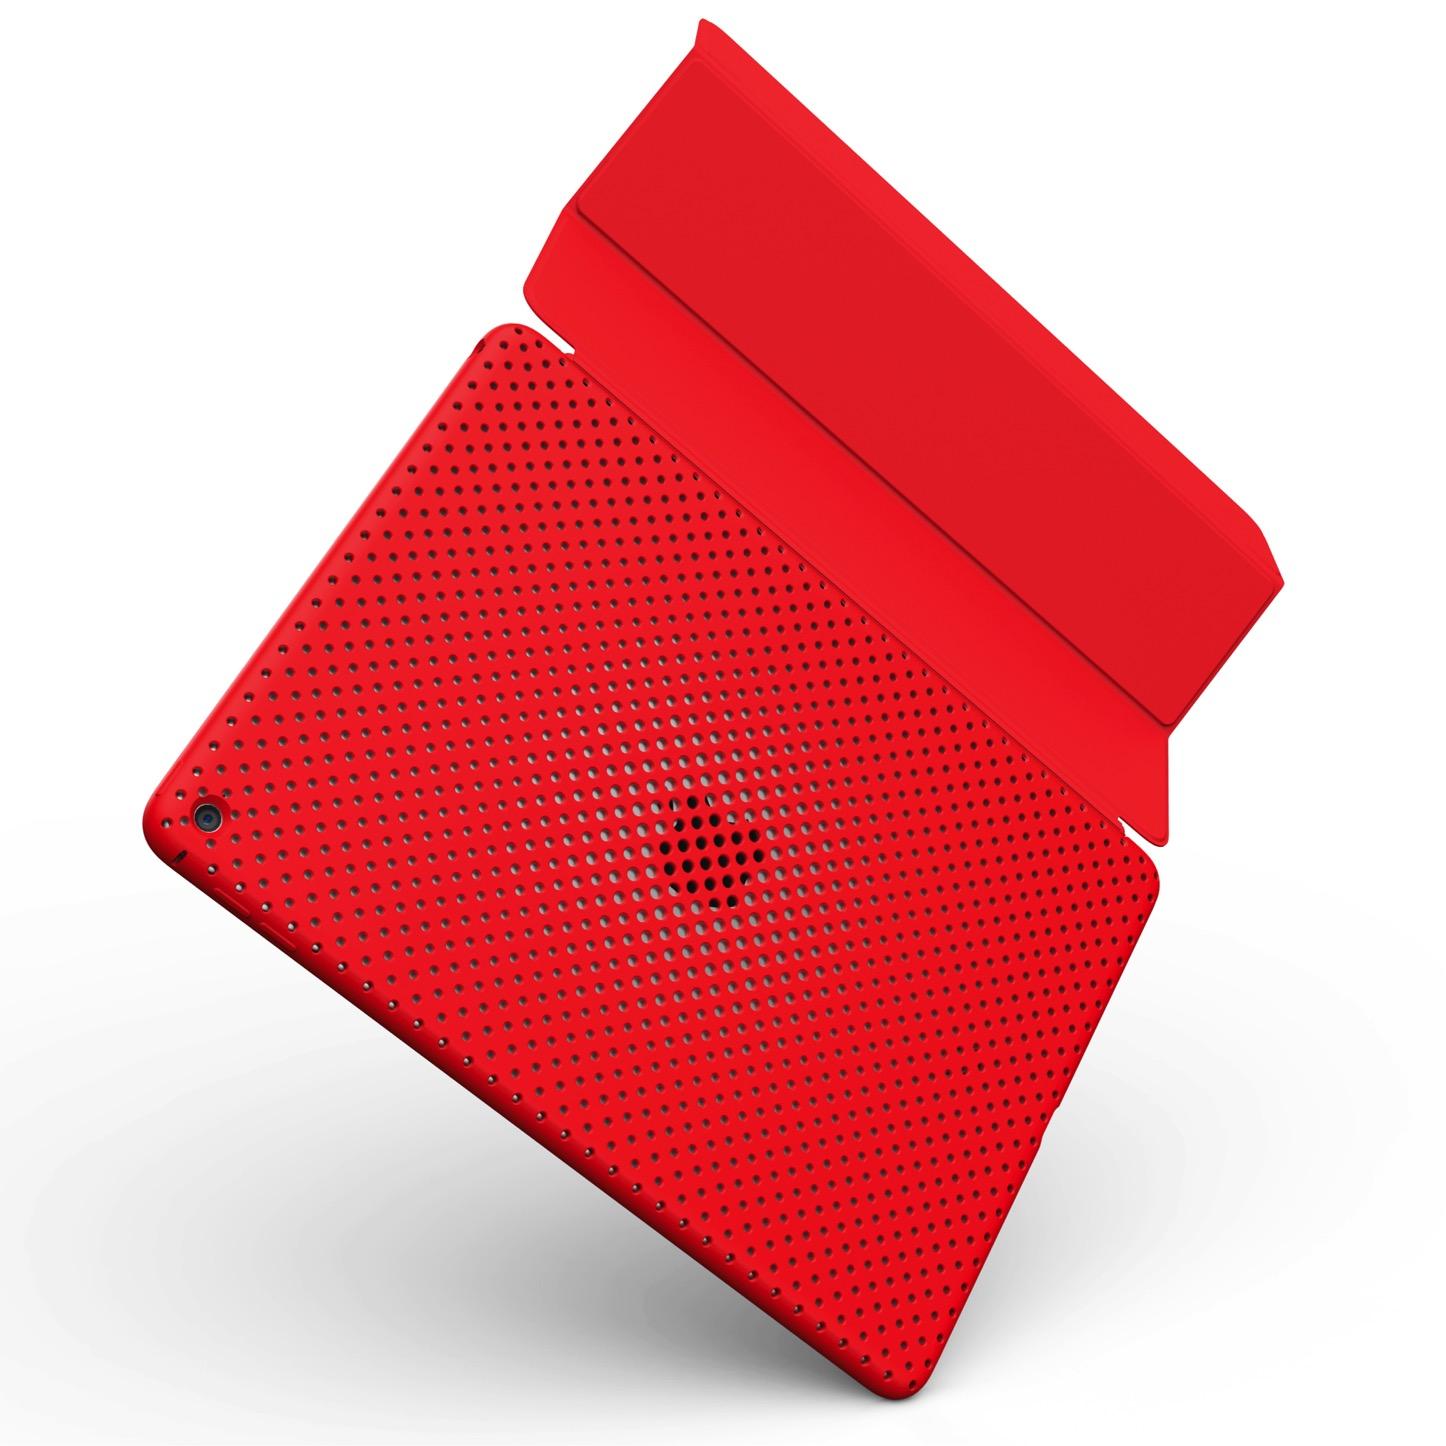 AndMesh iPadAir2 main RED